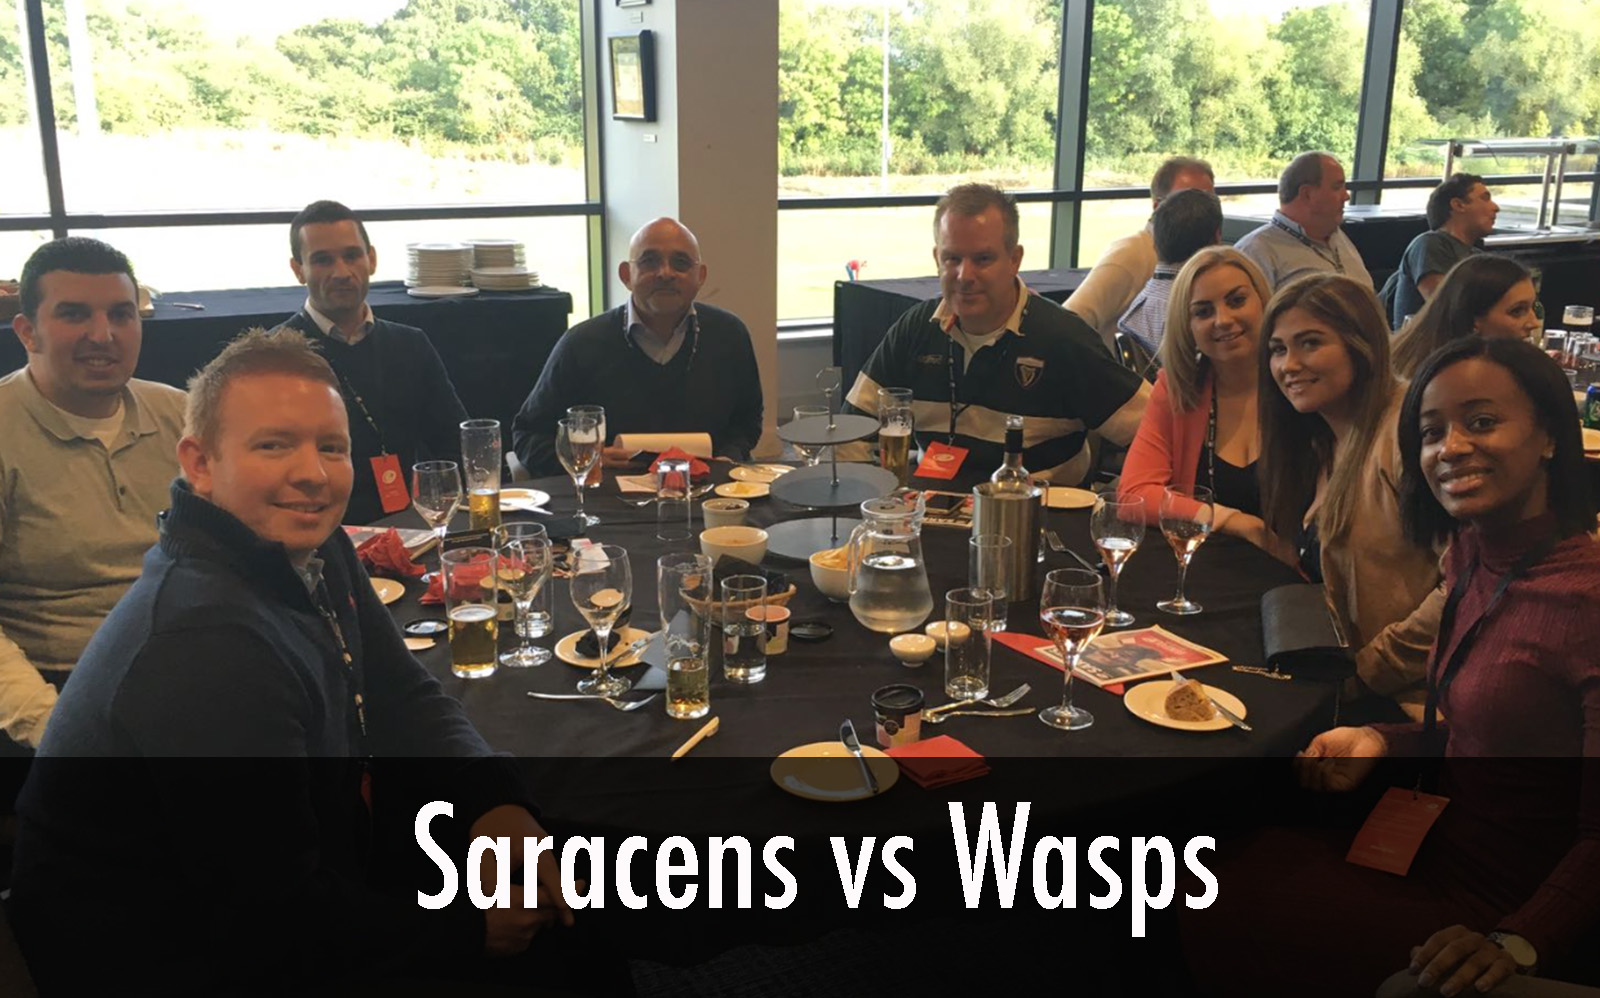 Saracens vs wasps 1905